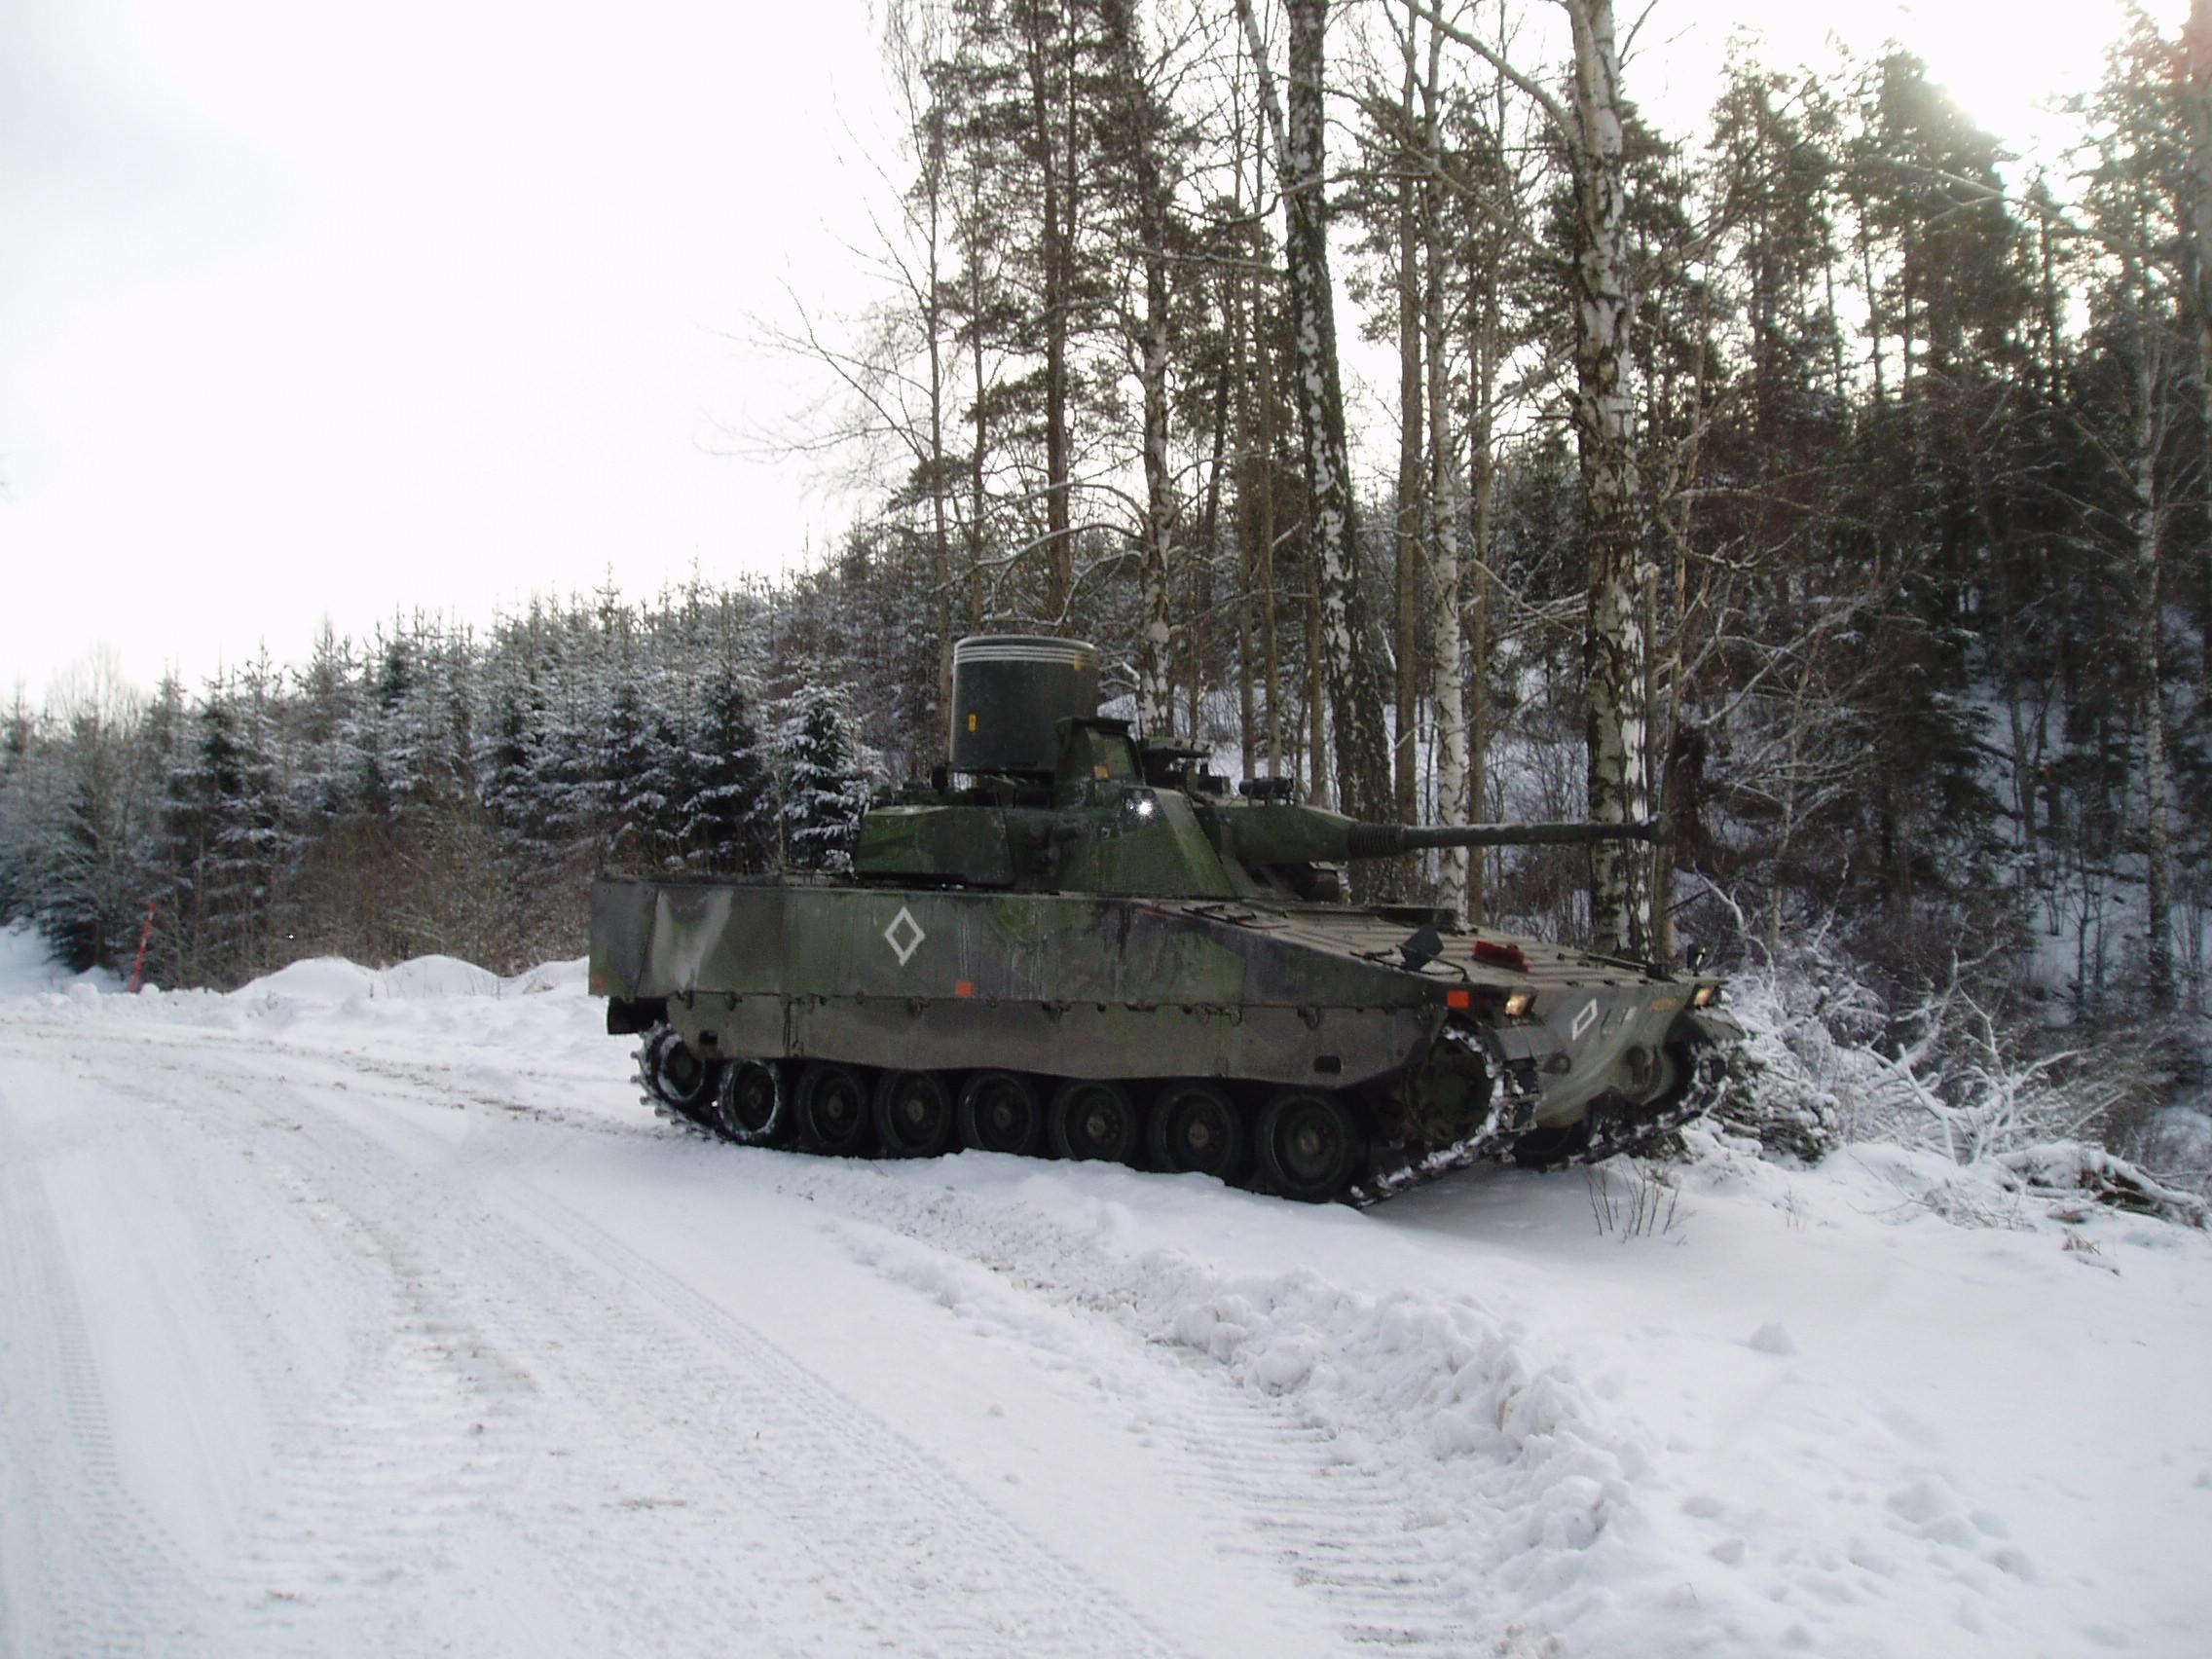 http://upload.wikimedia.org/wikipedia/commons/3/34/Swedish_CV9040_AAV_-_Anti-Air_Vehicle.JPG